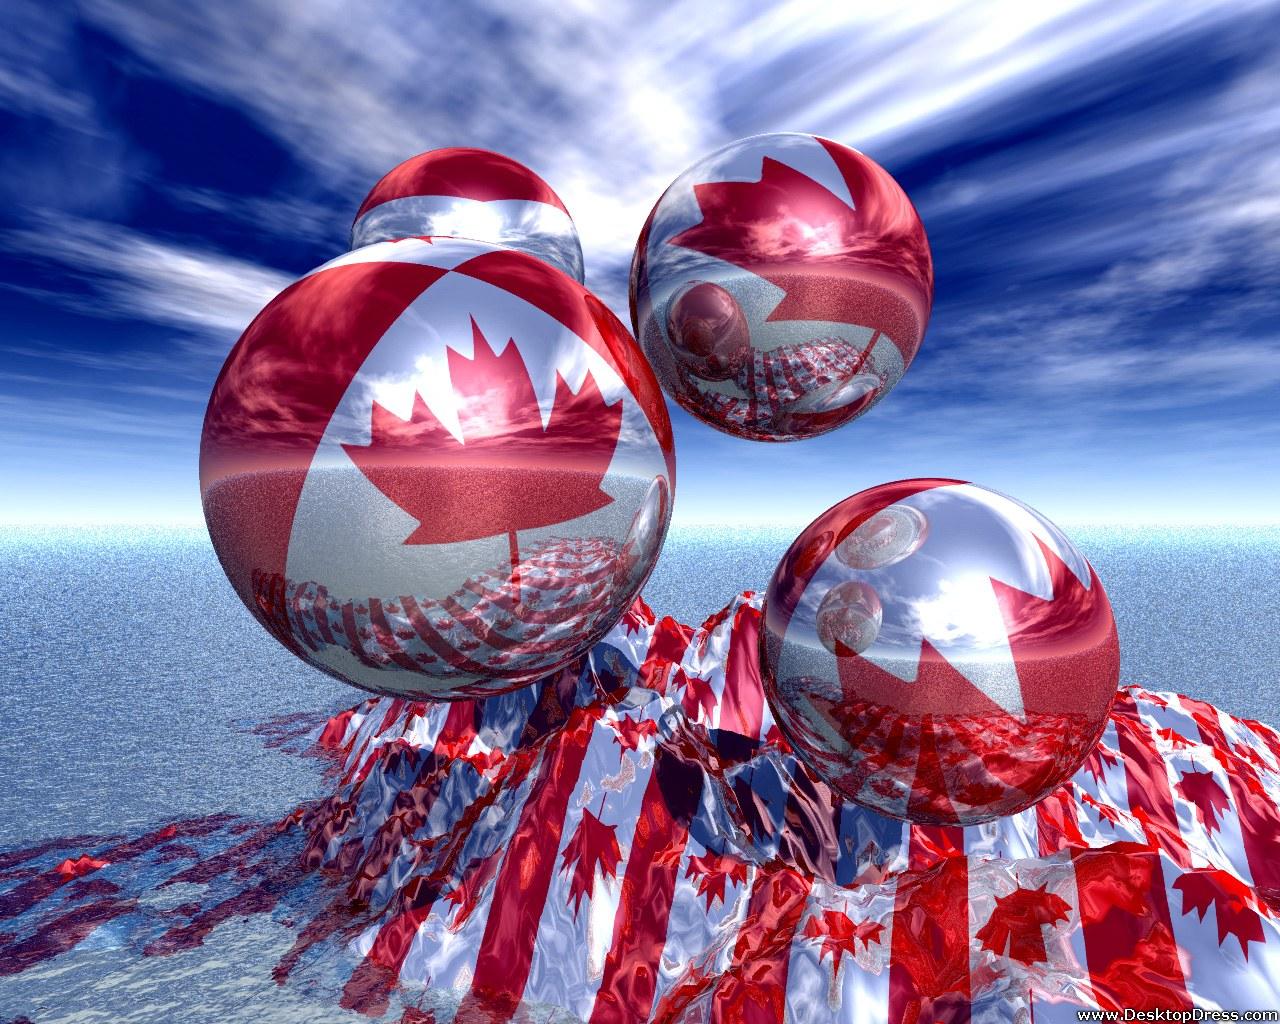 Desktop Wallpapers 3D Backgrounds Oh Canada wwwdesktopdress 1280x1024